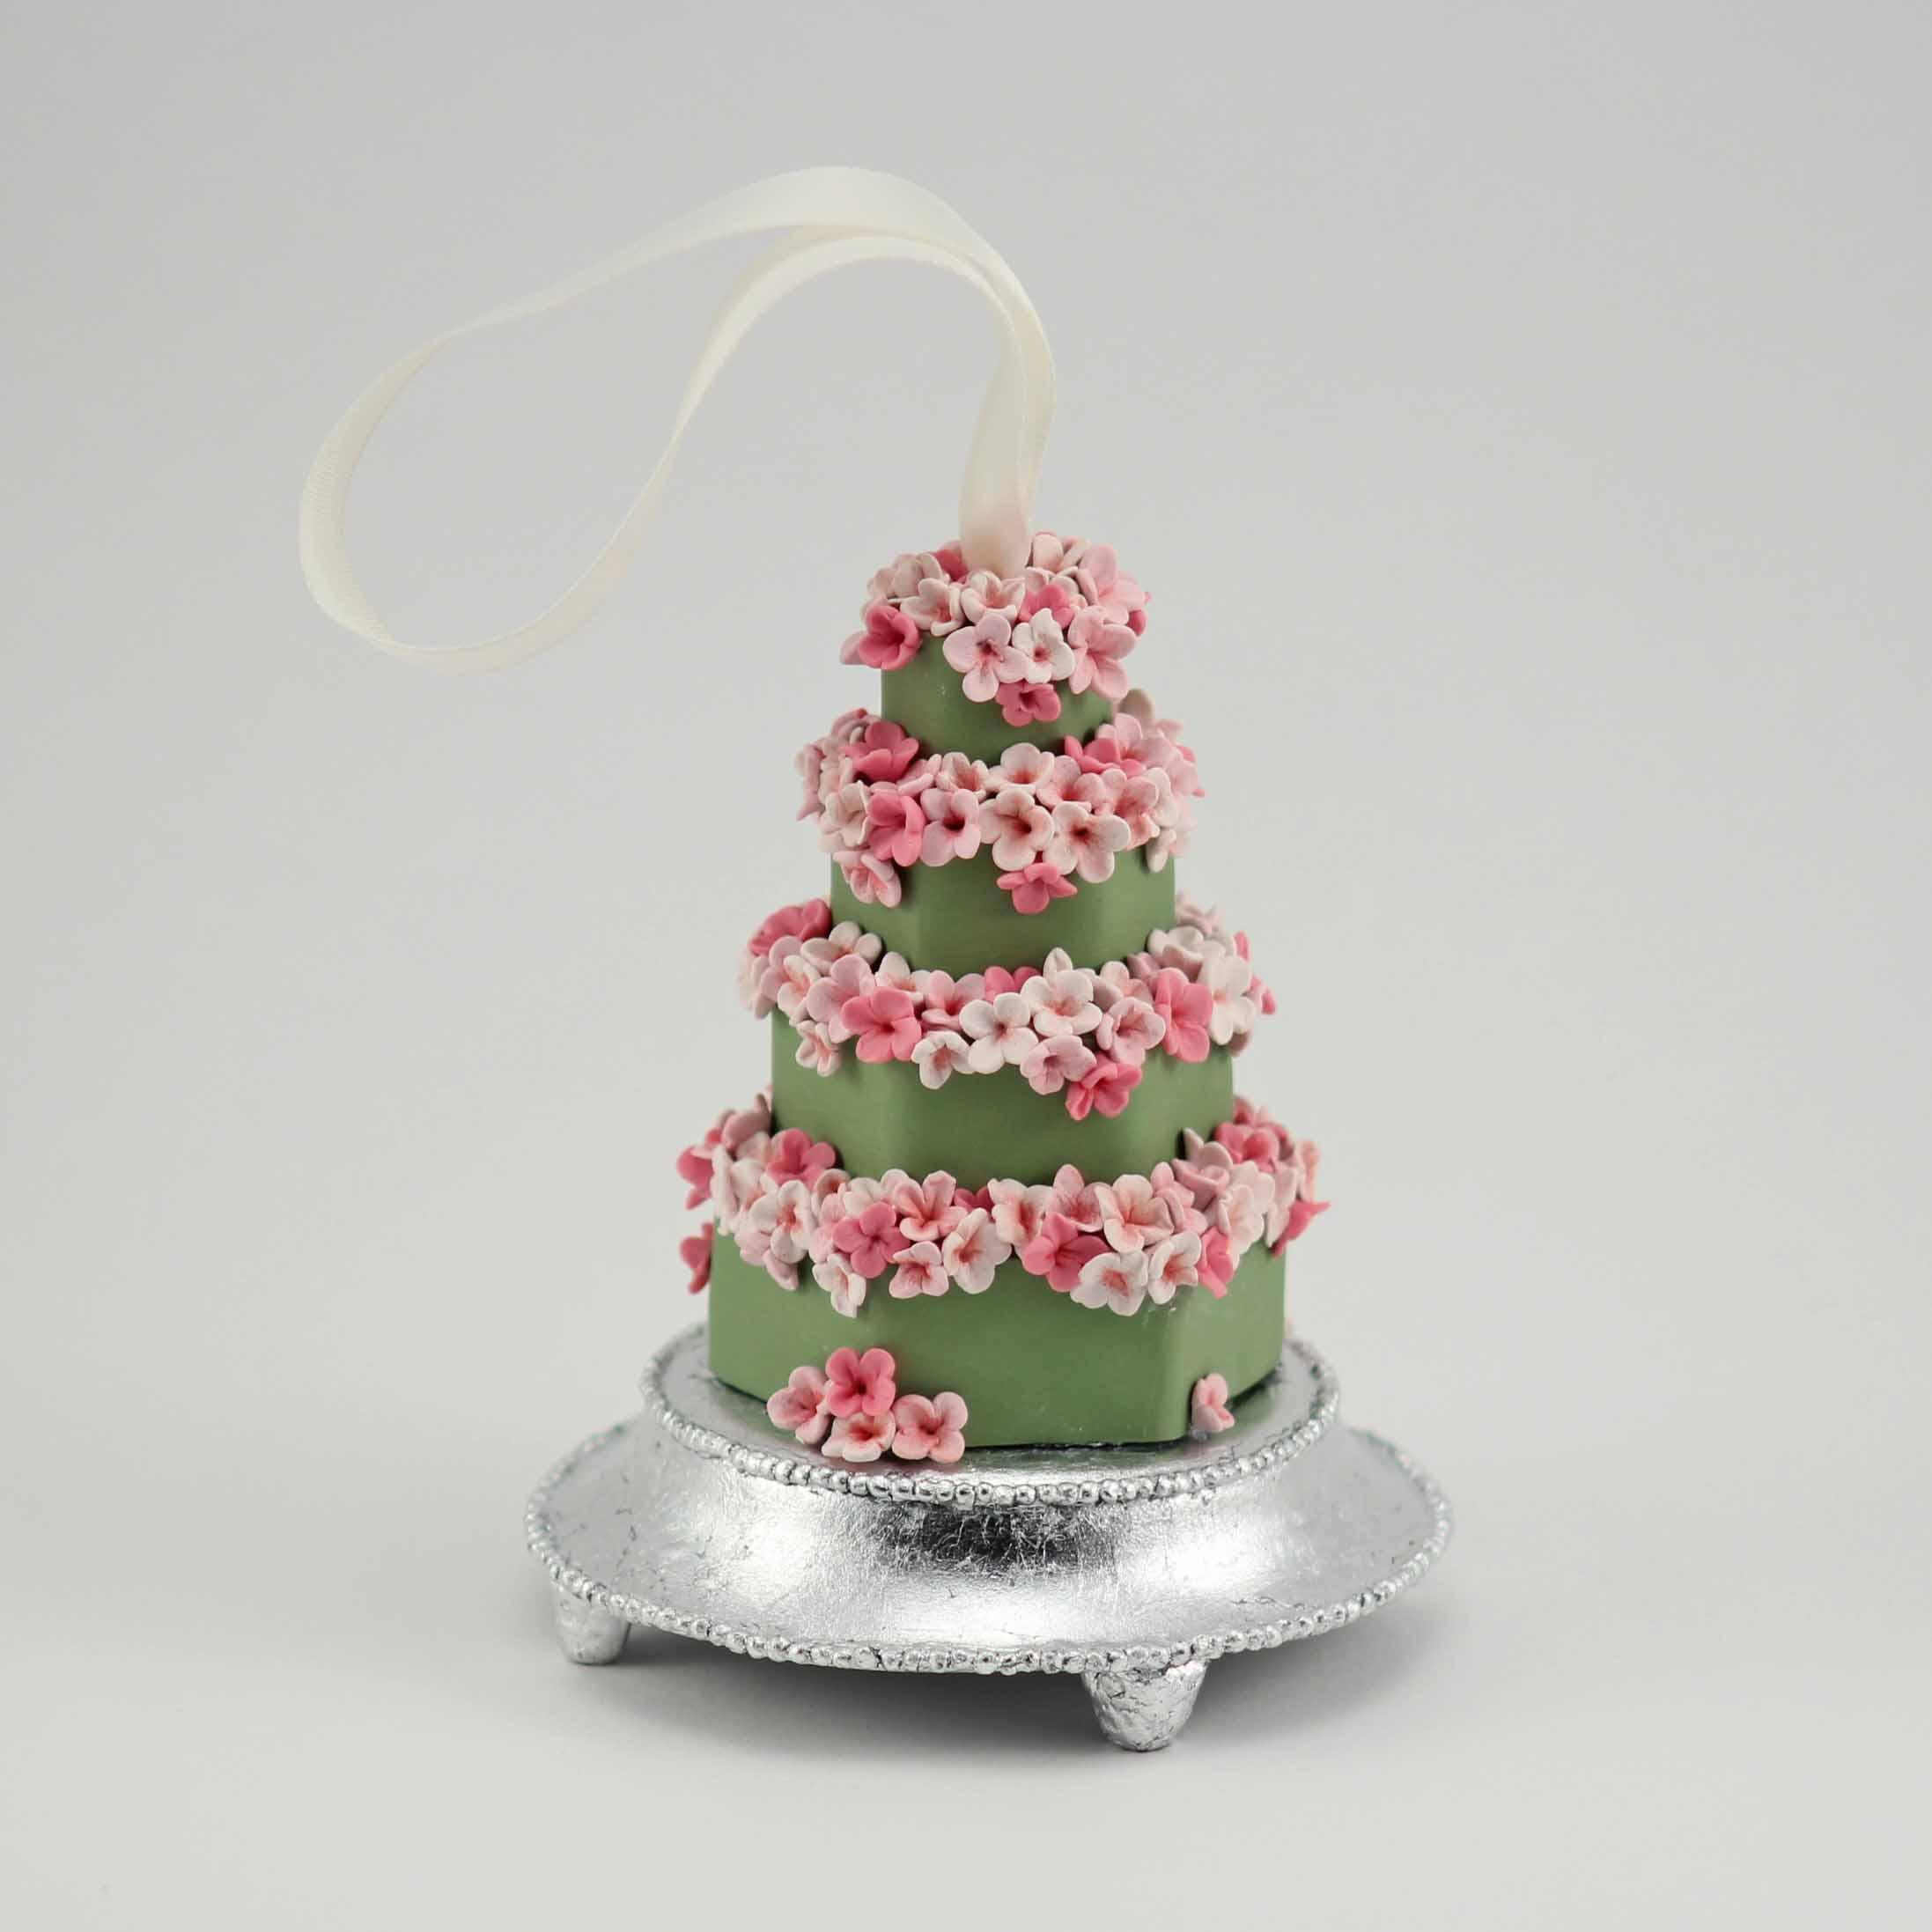 minature replica of a Green and cherryblossom cake.jpg